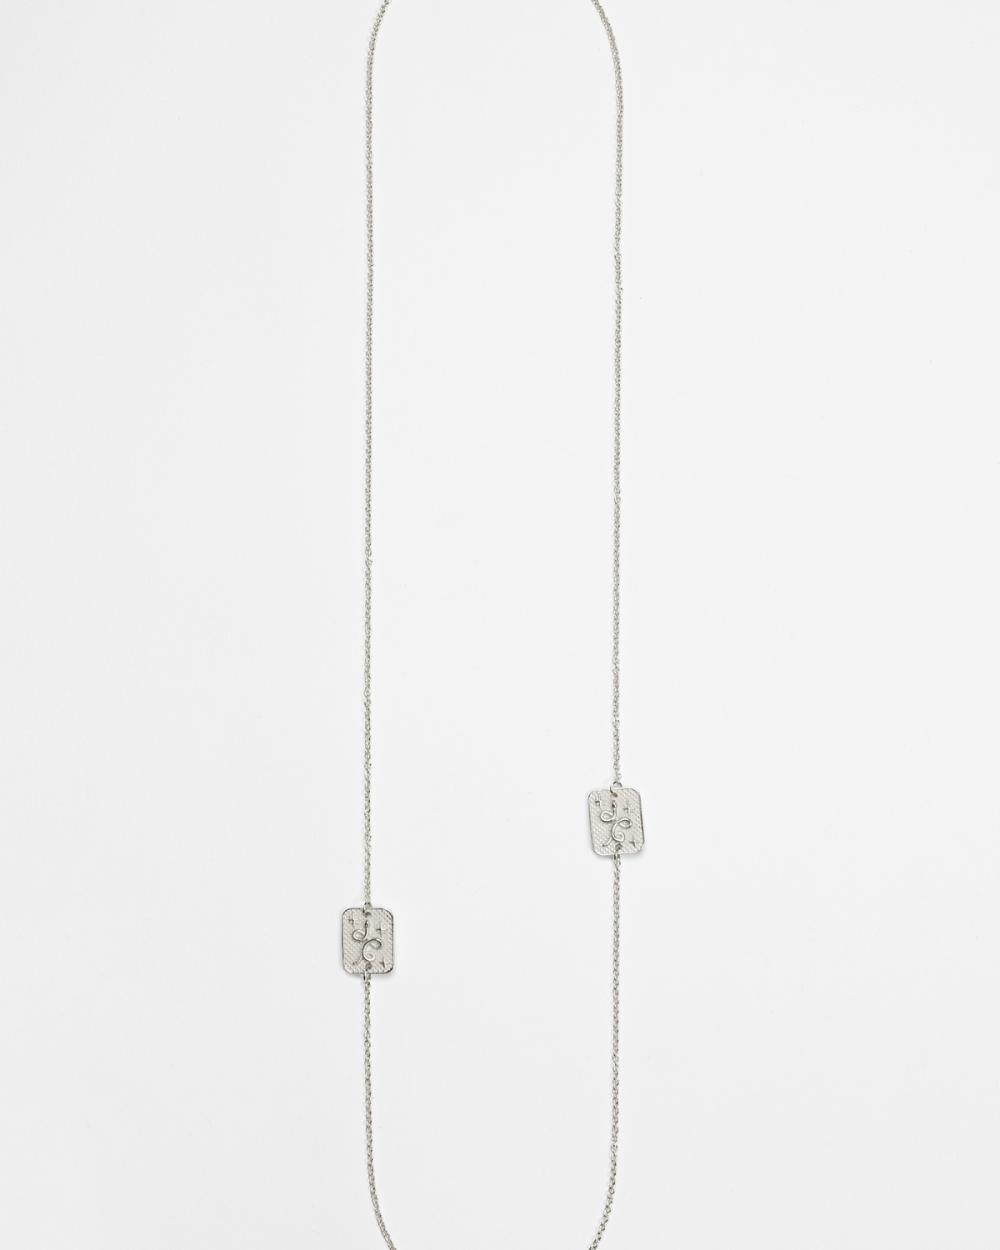 silver scapular necklace tarot